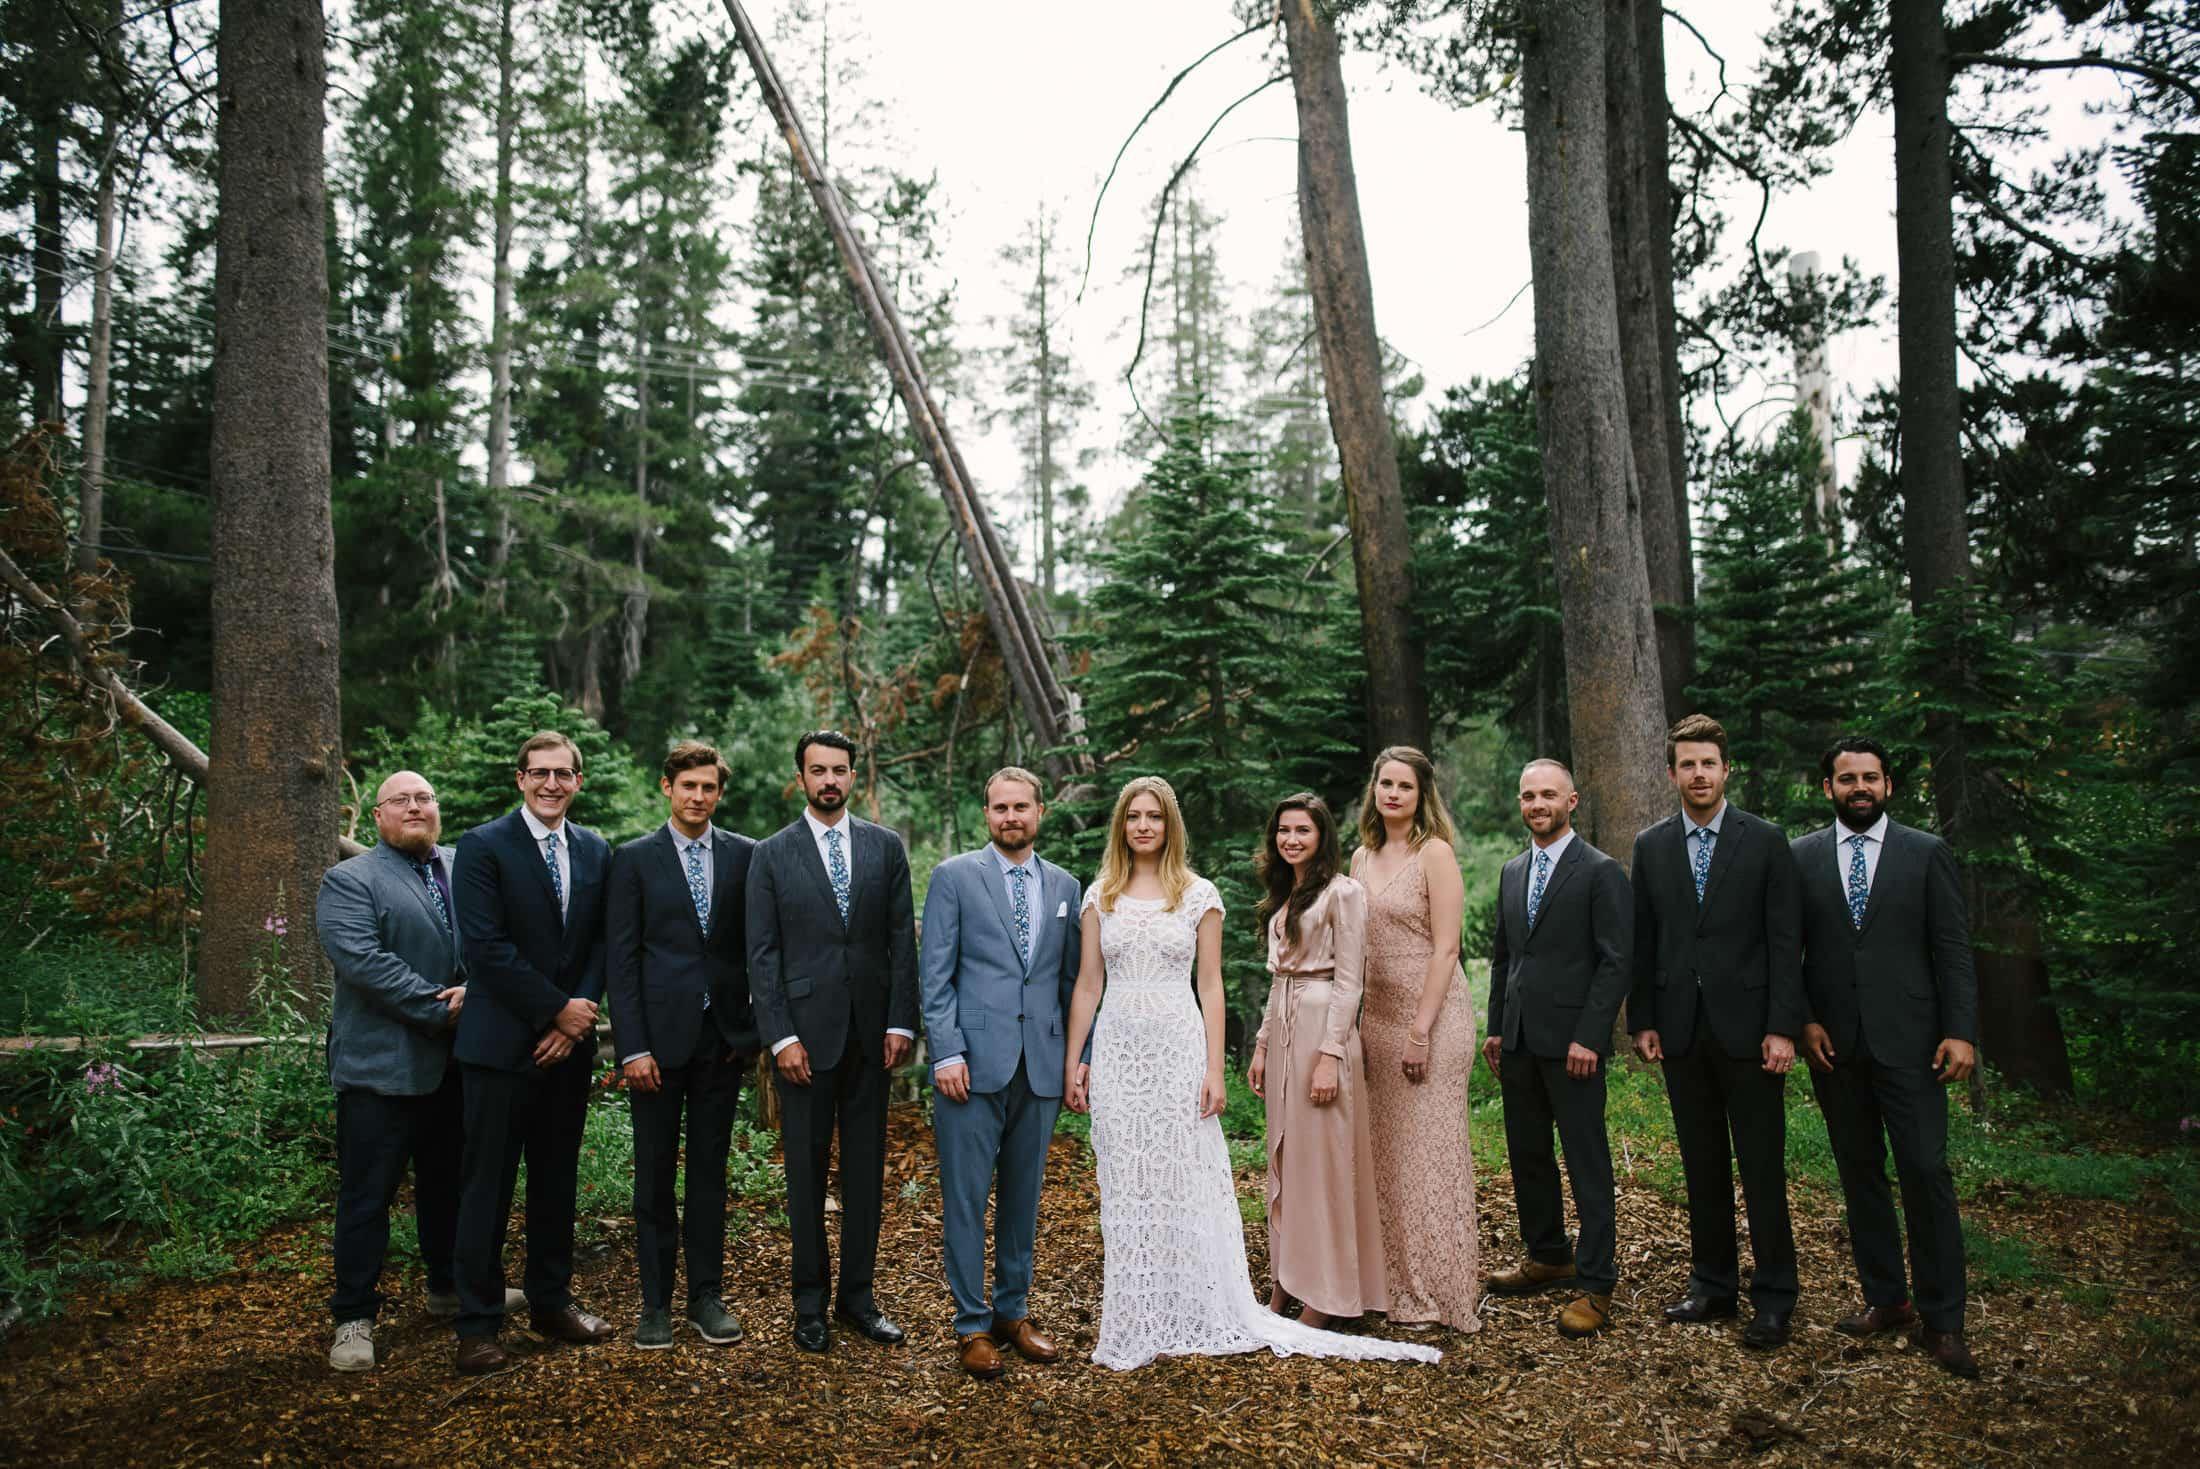 Sugar Bowl in Lake Tahoe Wedding Party Portrait